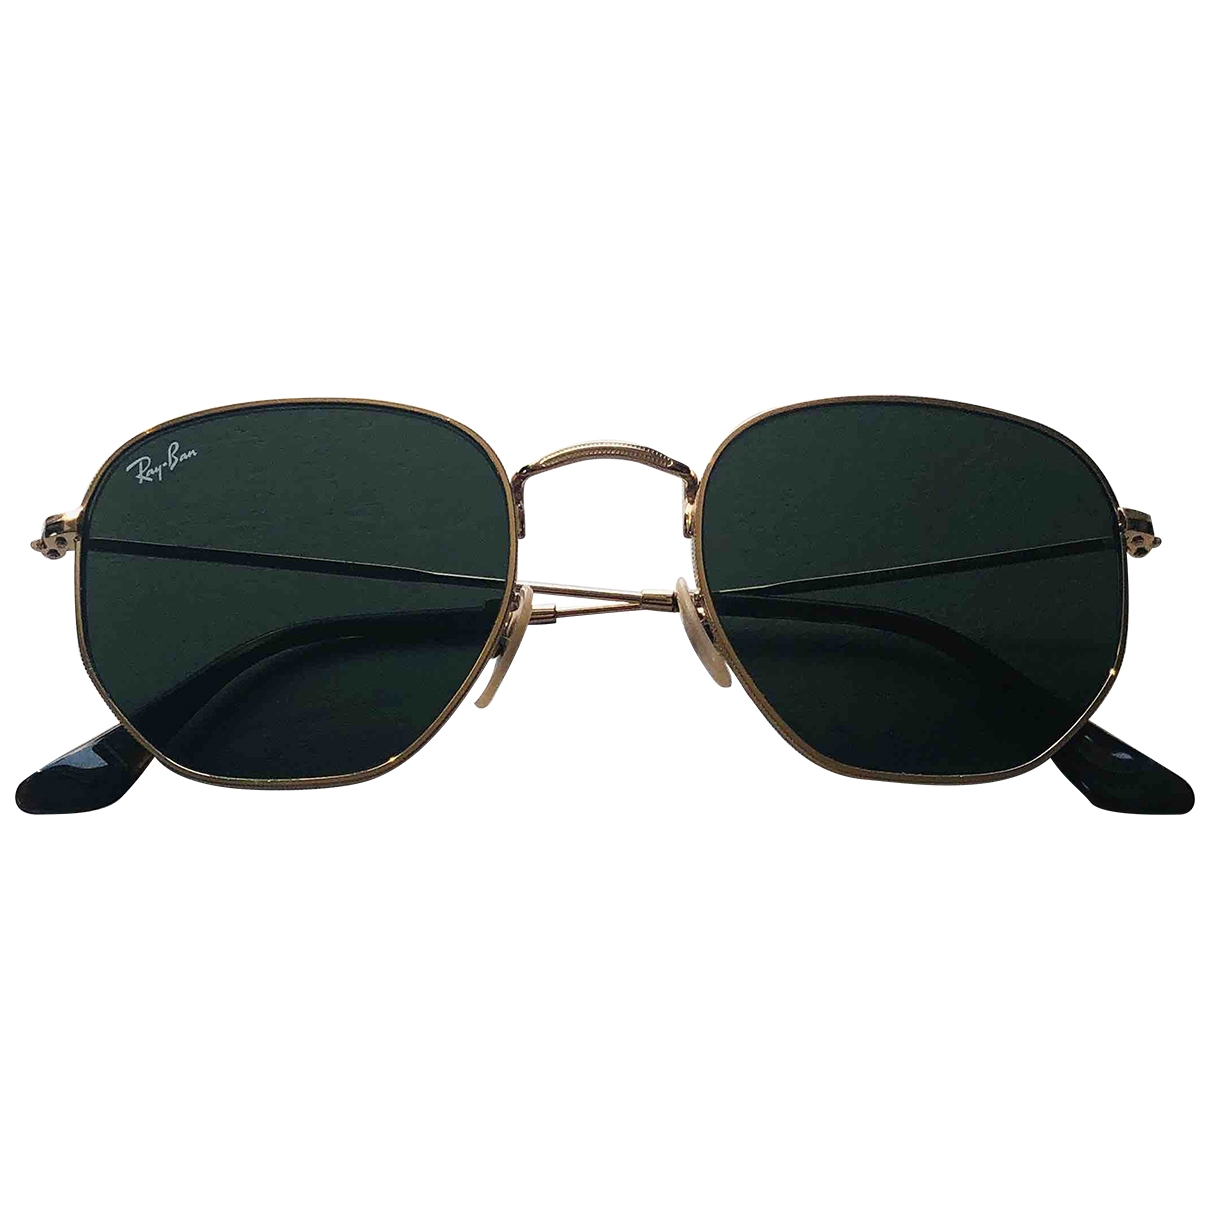 Ray-ban Hexagonal Gold Metal Sunglasses for Women \N